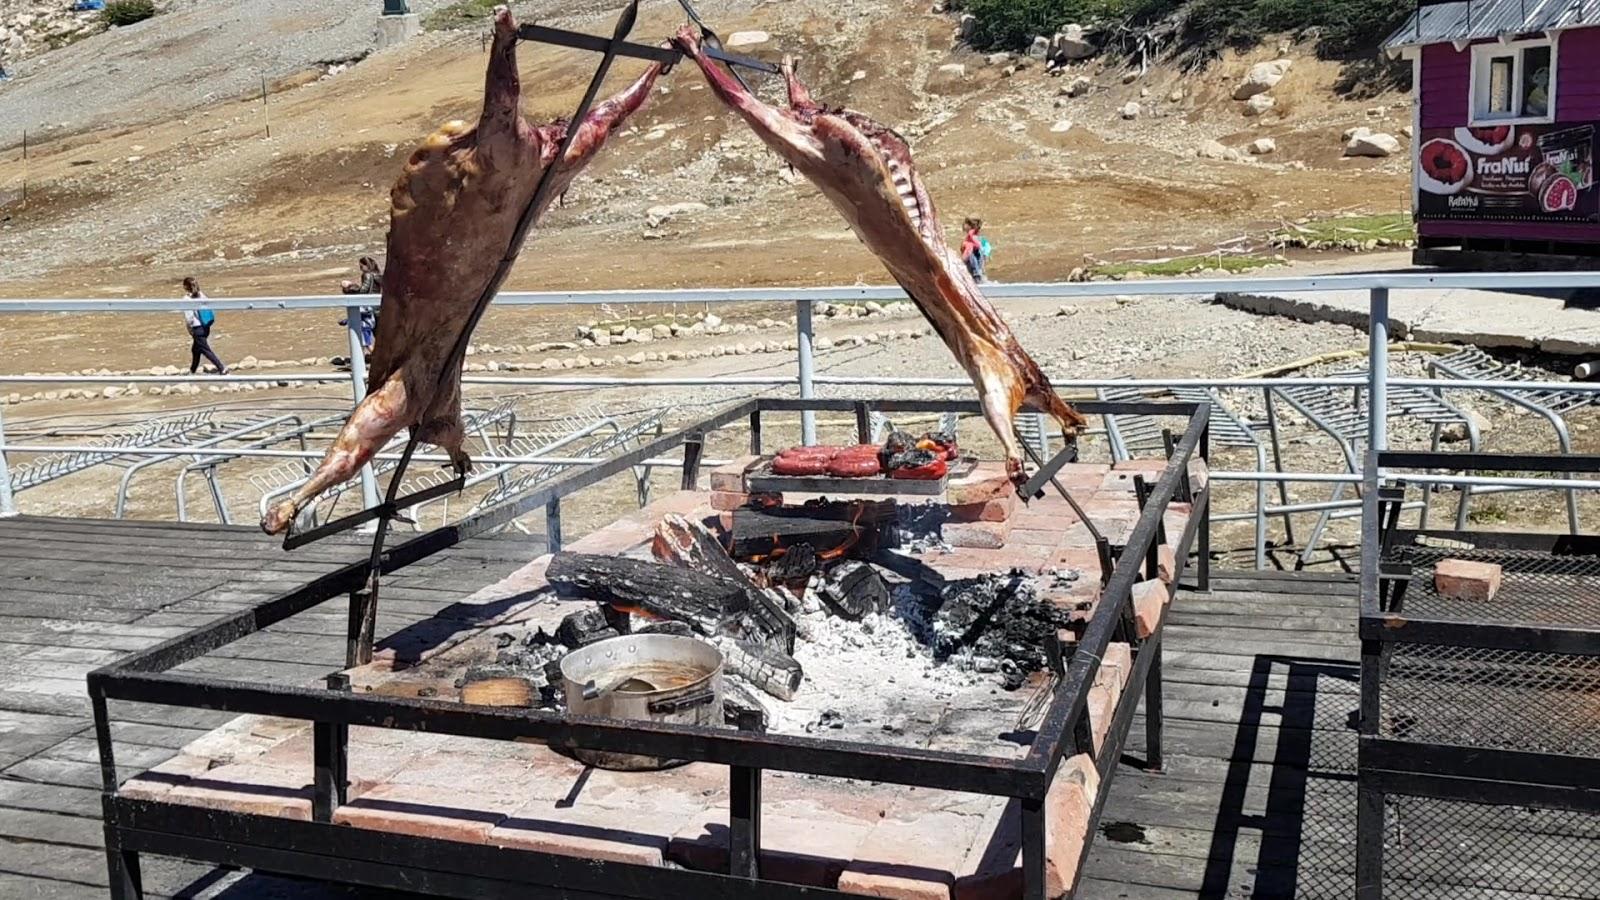 Patagonia parrilla asador criollo